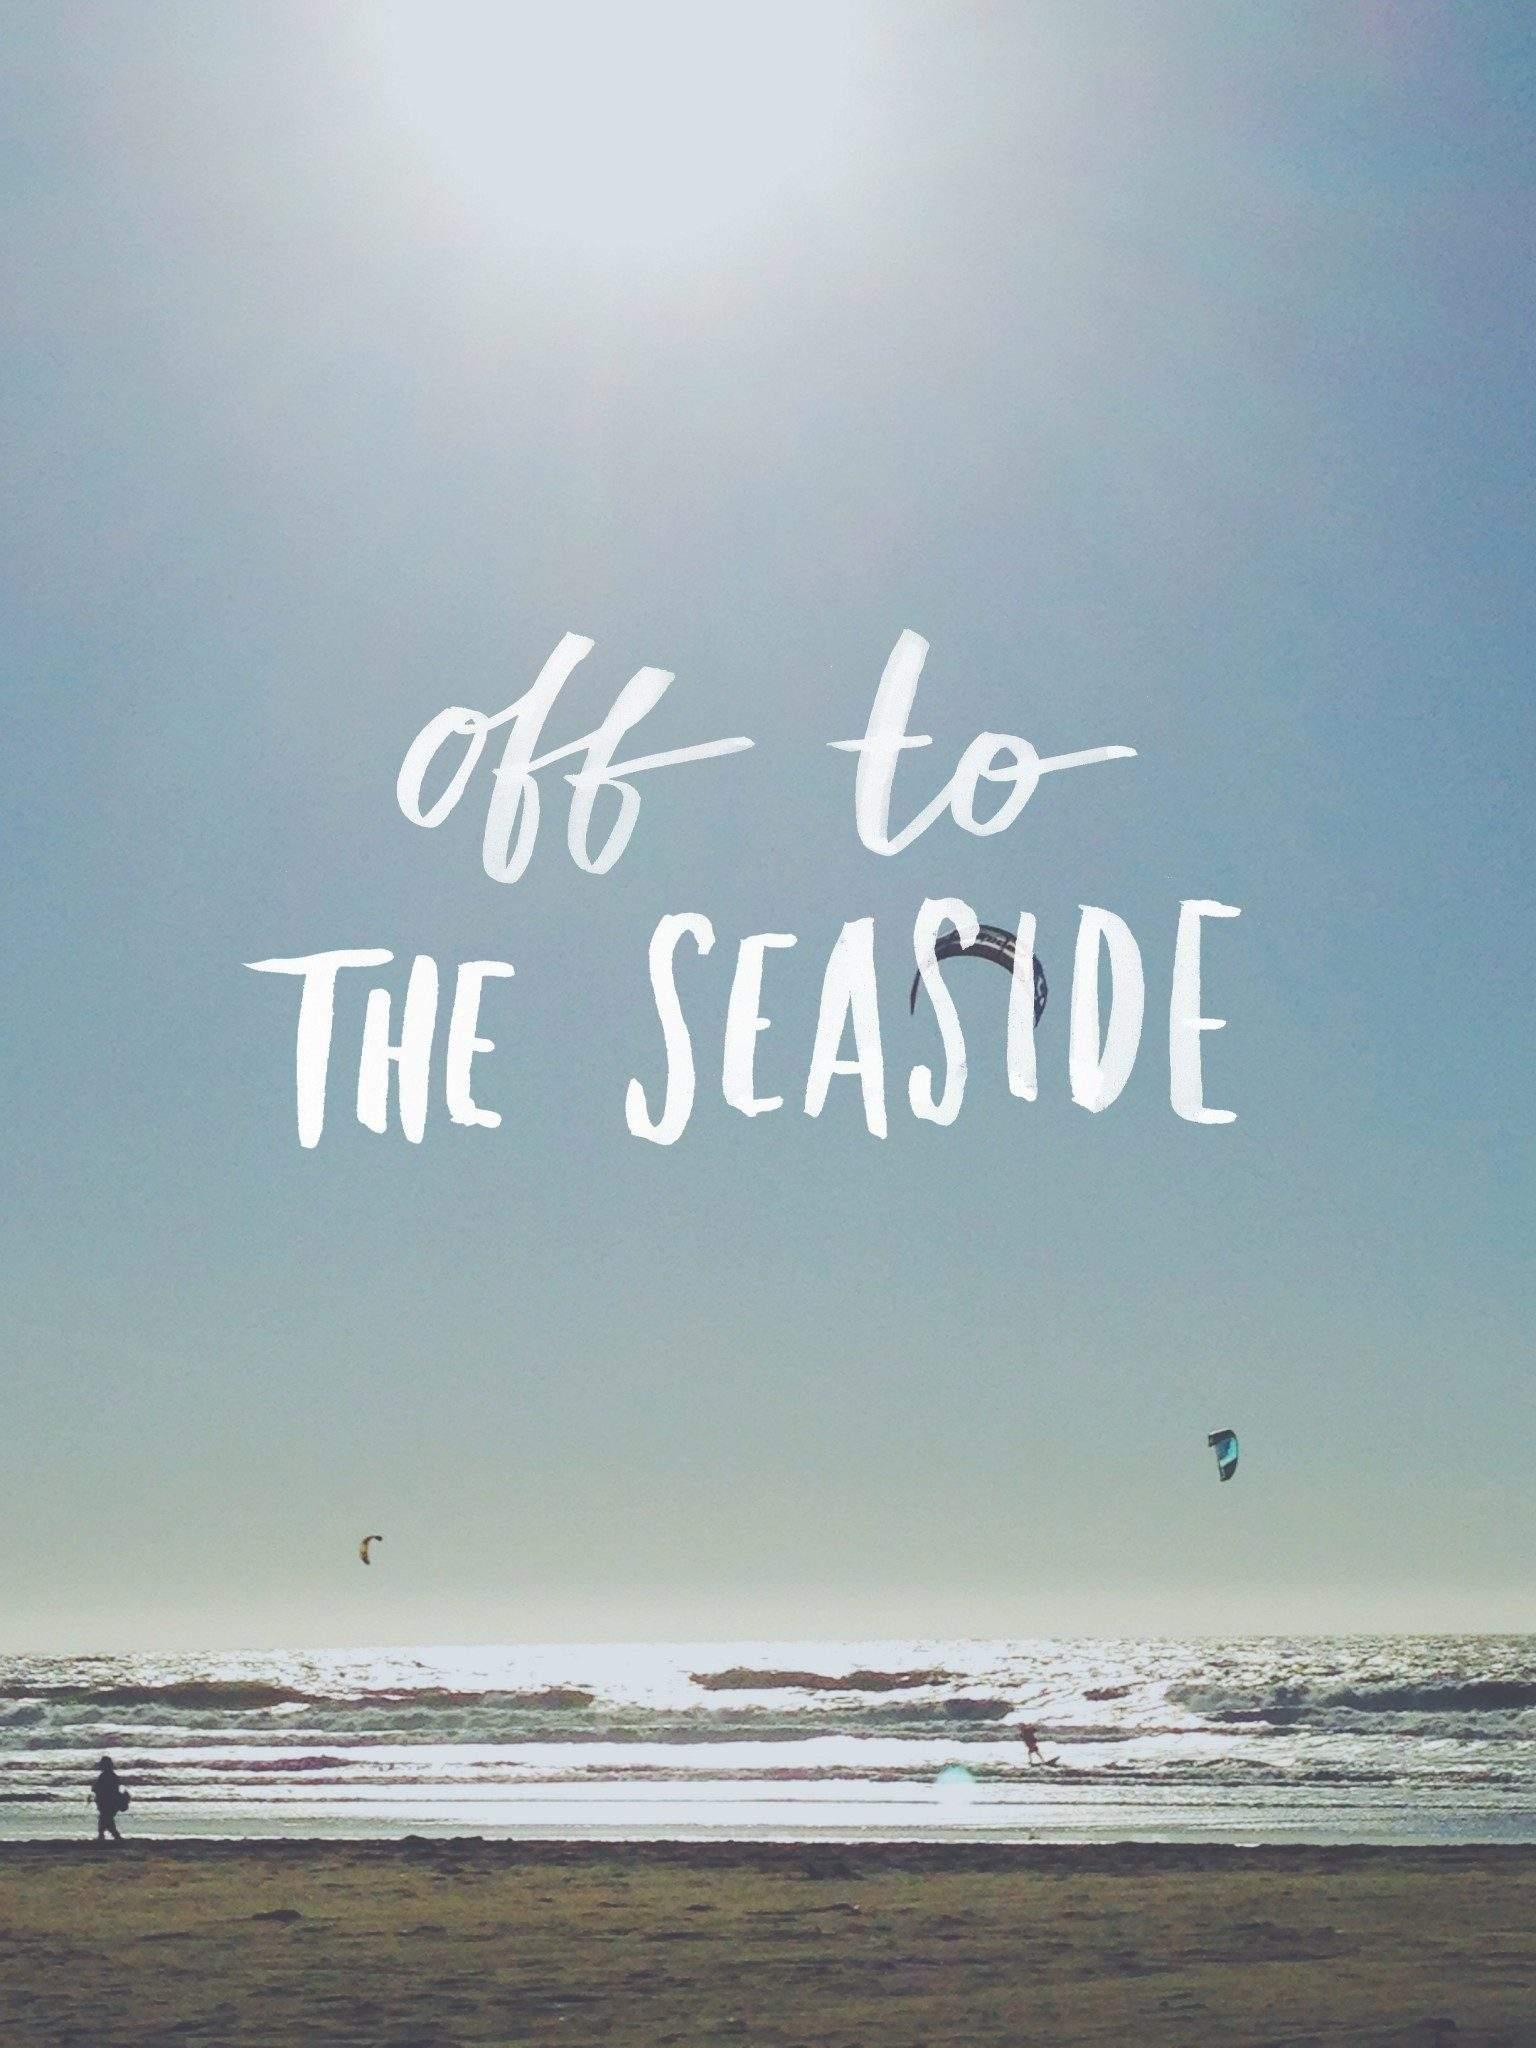 seaside-photo-kinlake-handlettering